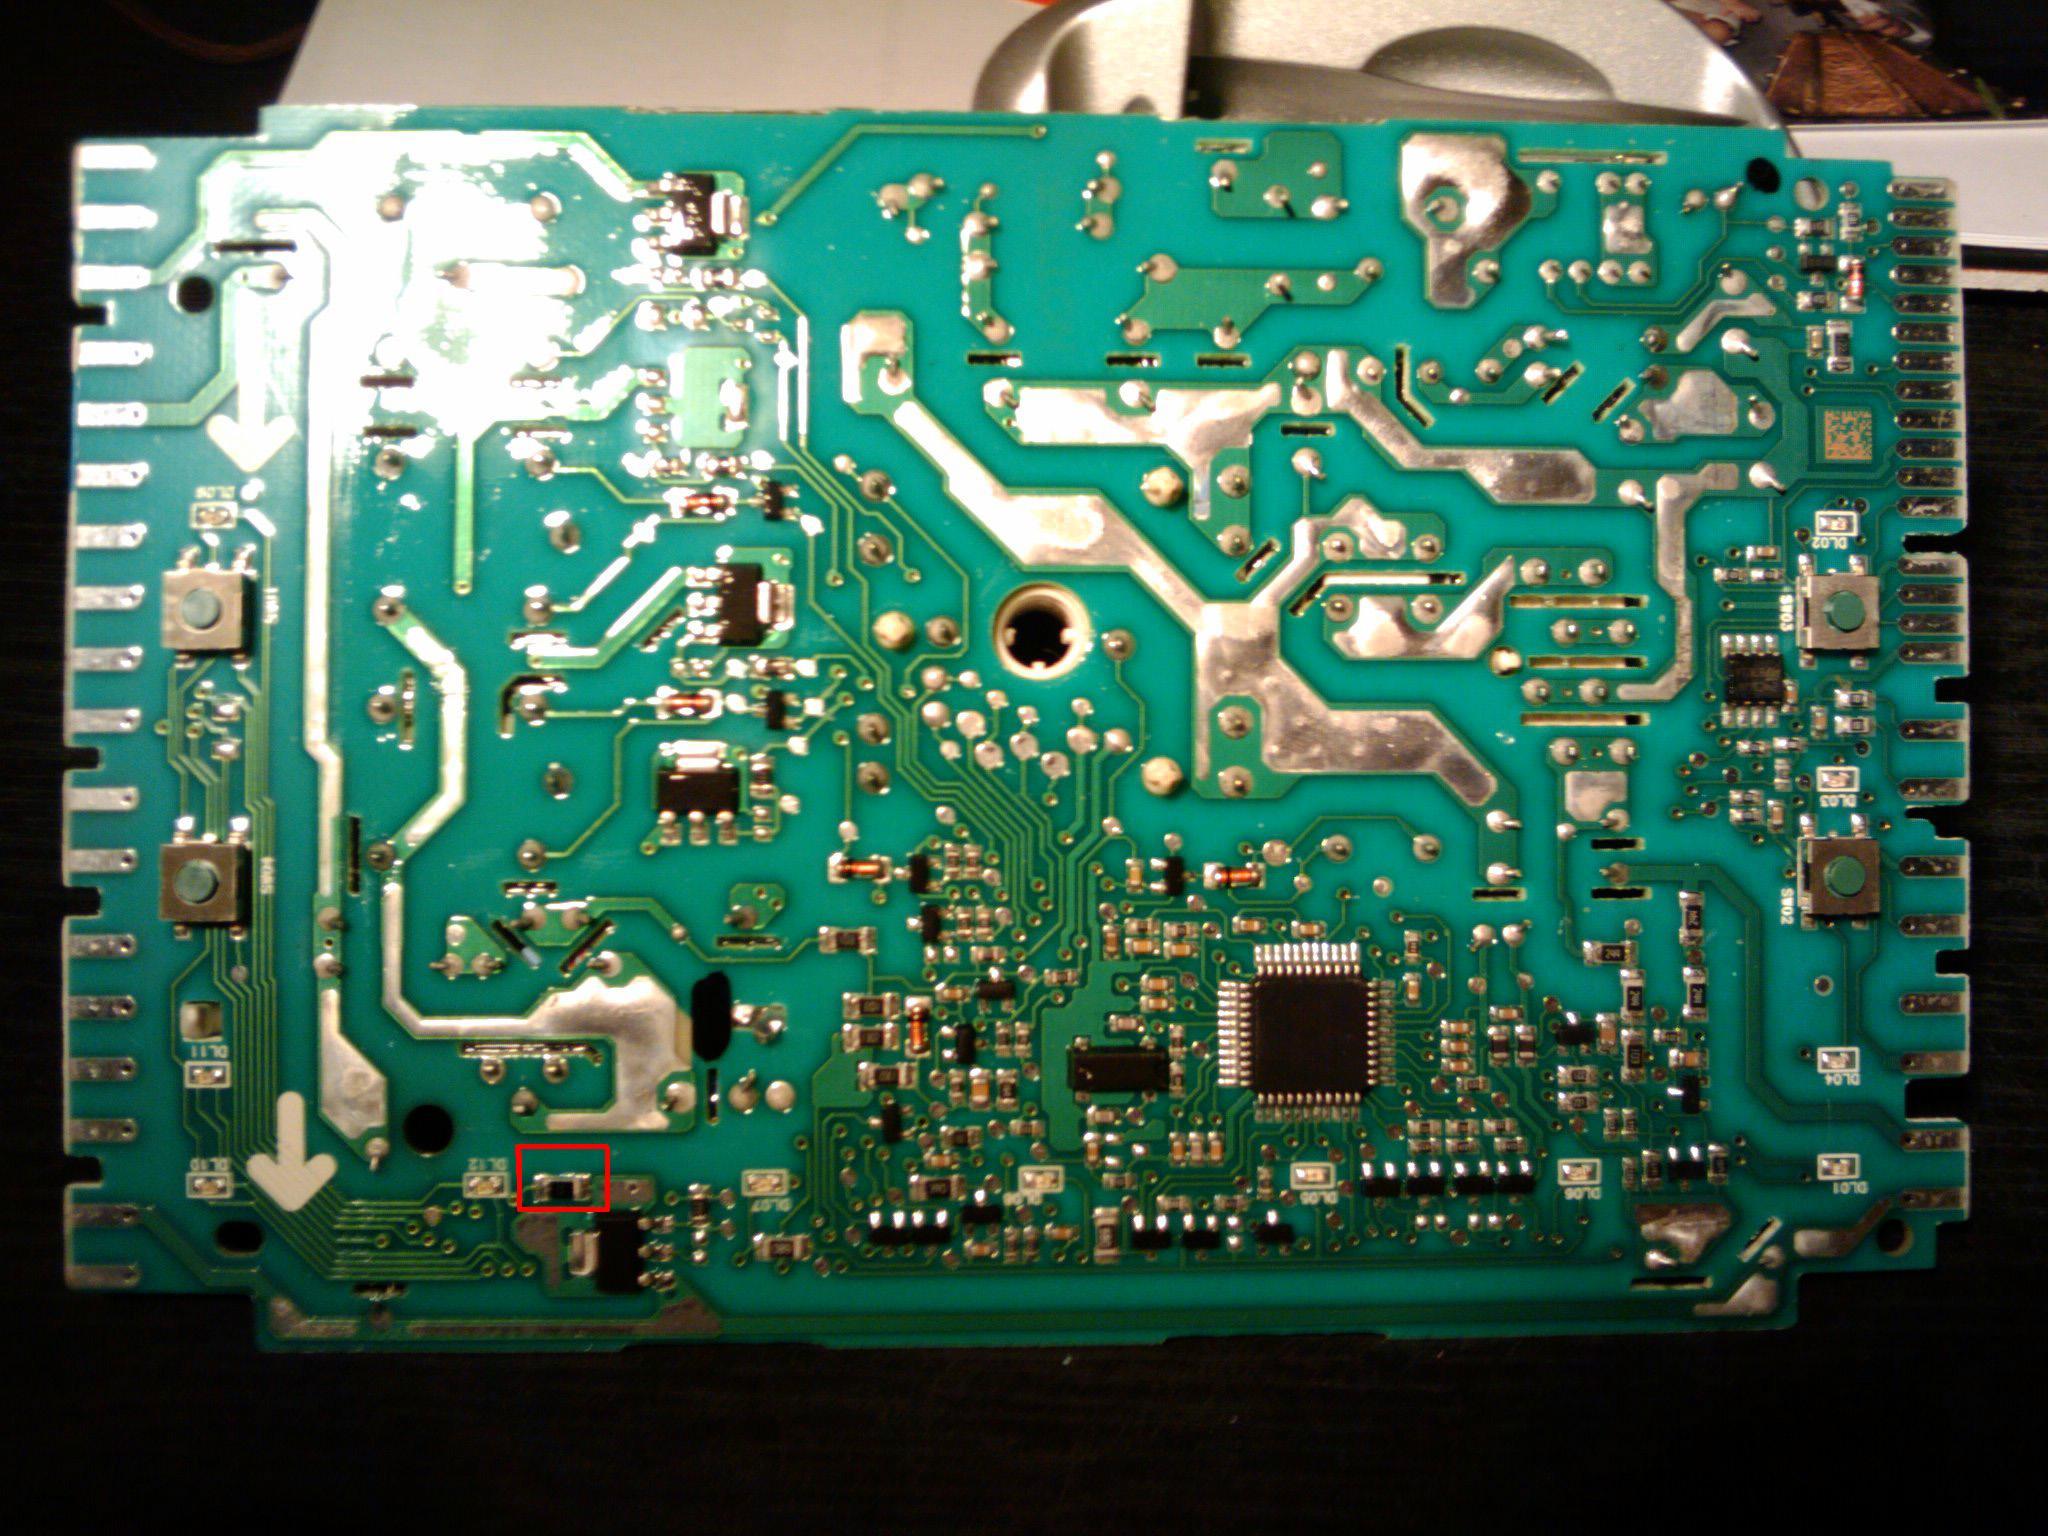 Pralka Polar PTL 1000 - uszkodzona elektronika.